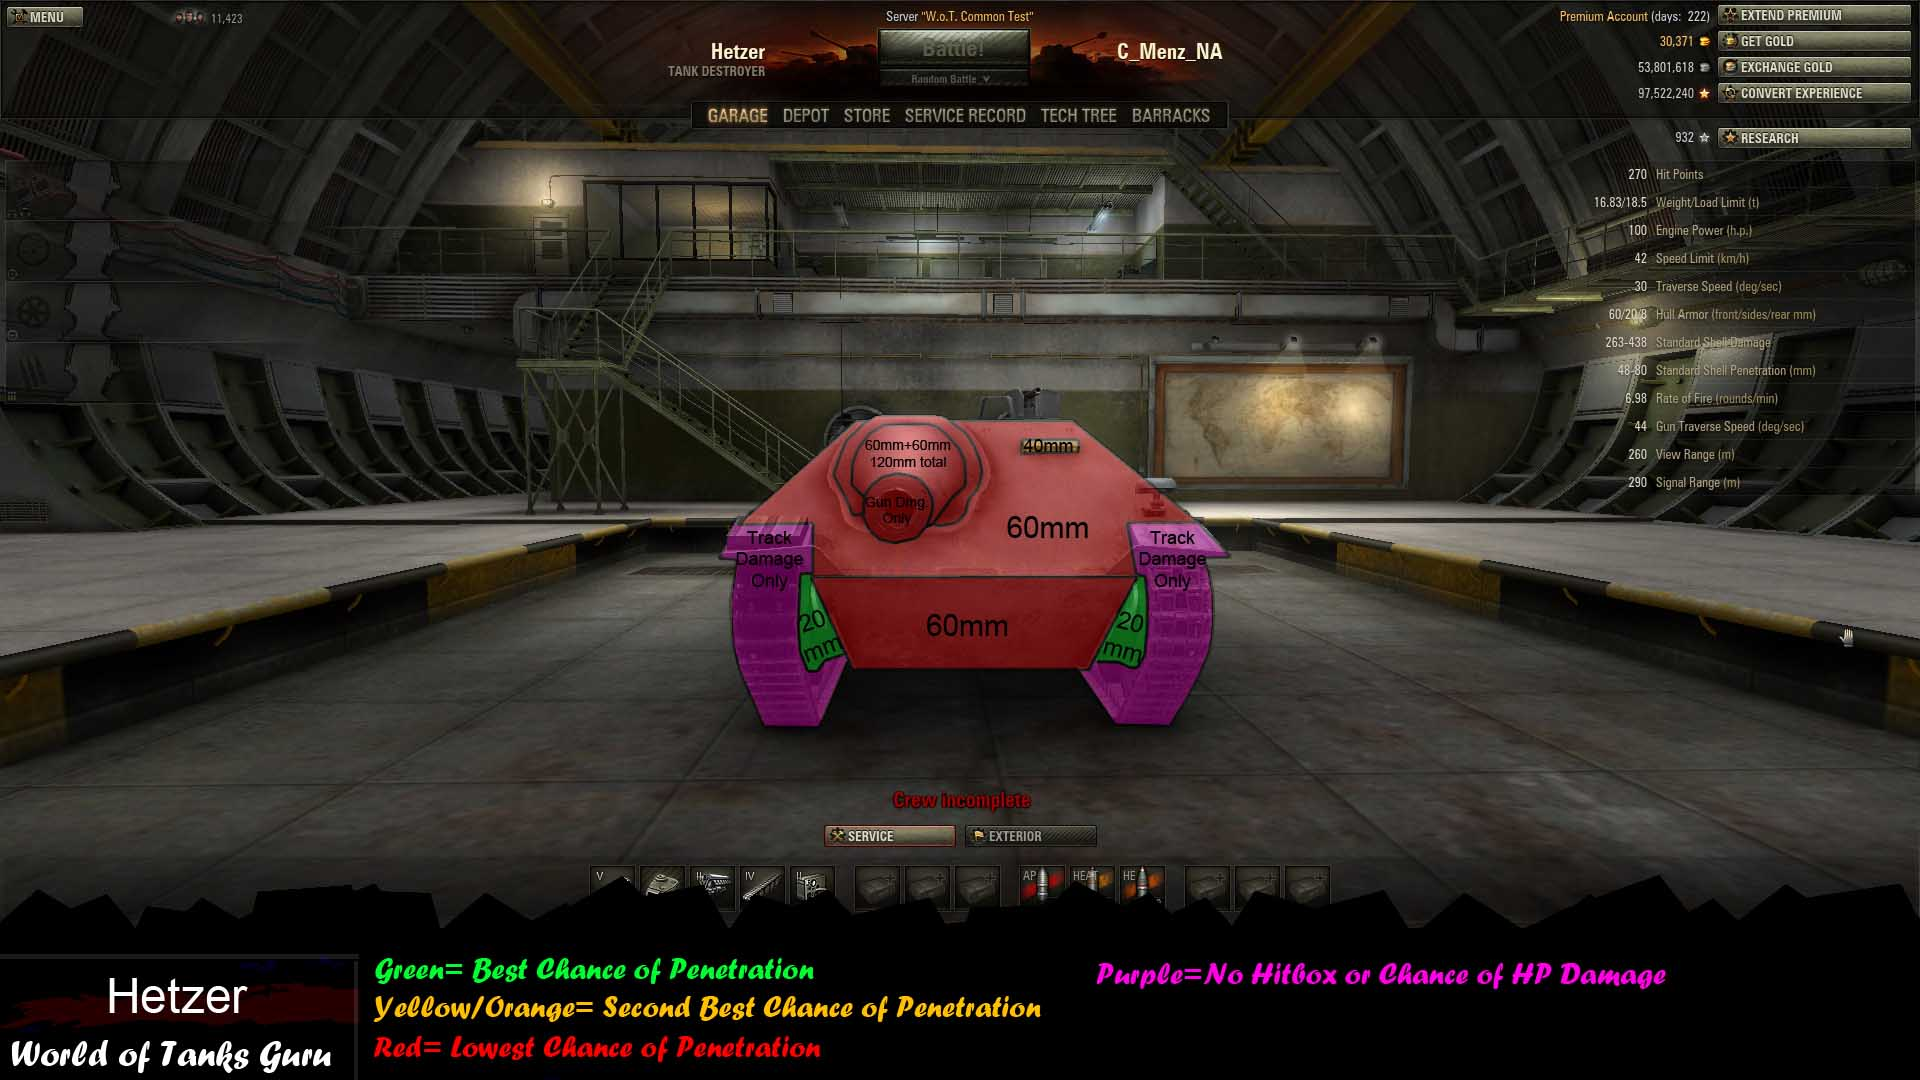 Weak Spot Guide: Hetzer - World of Tanks Guru